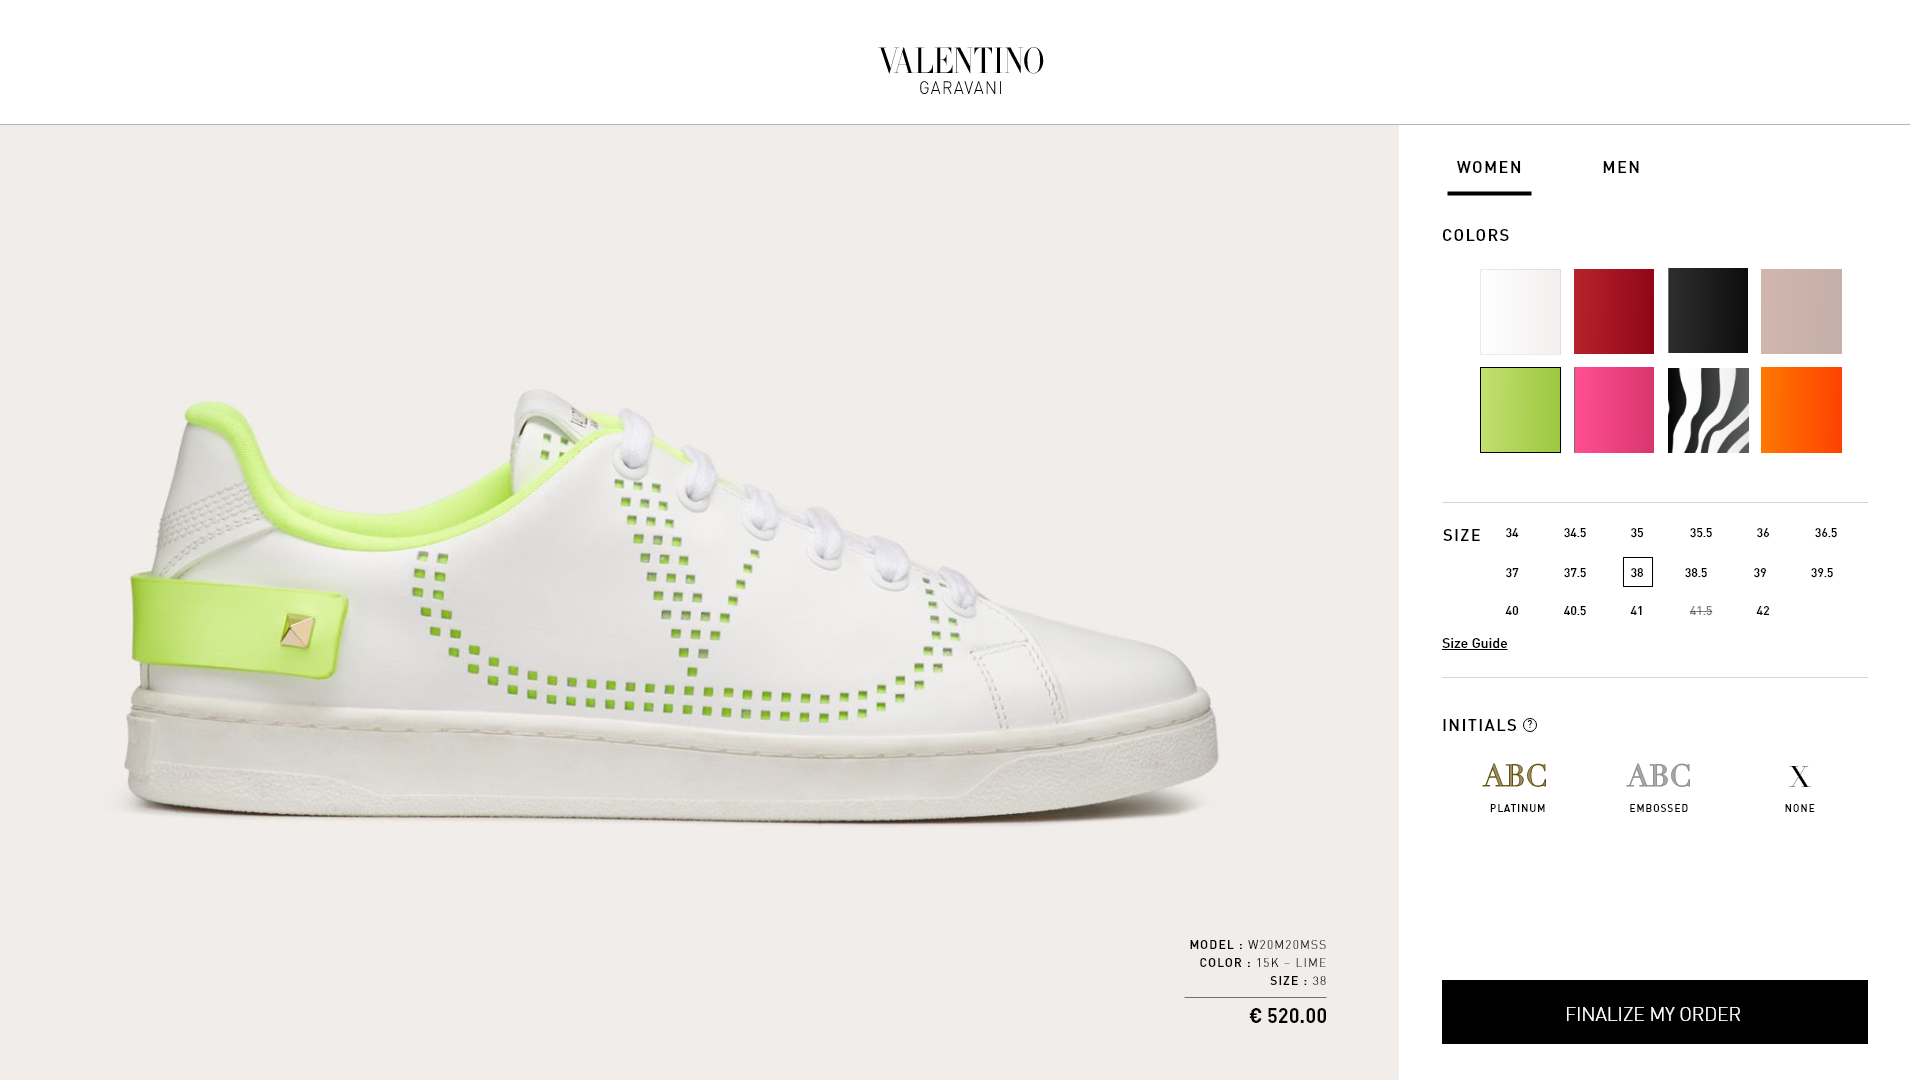 3D shoe Configurator, 3D shoes, Photorealistic 3d visuals of shoes, Valentino